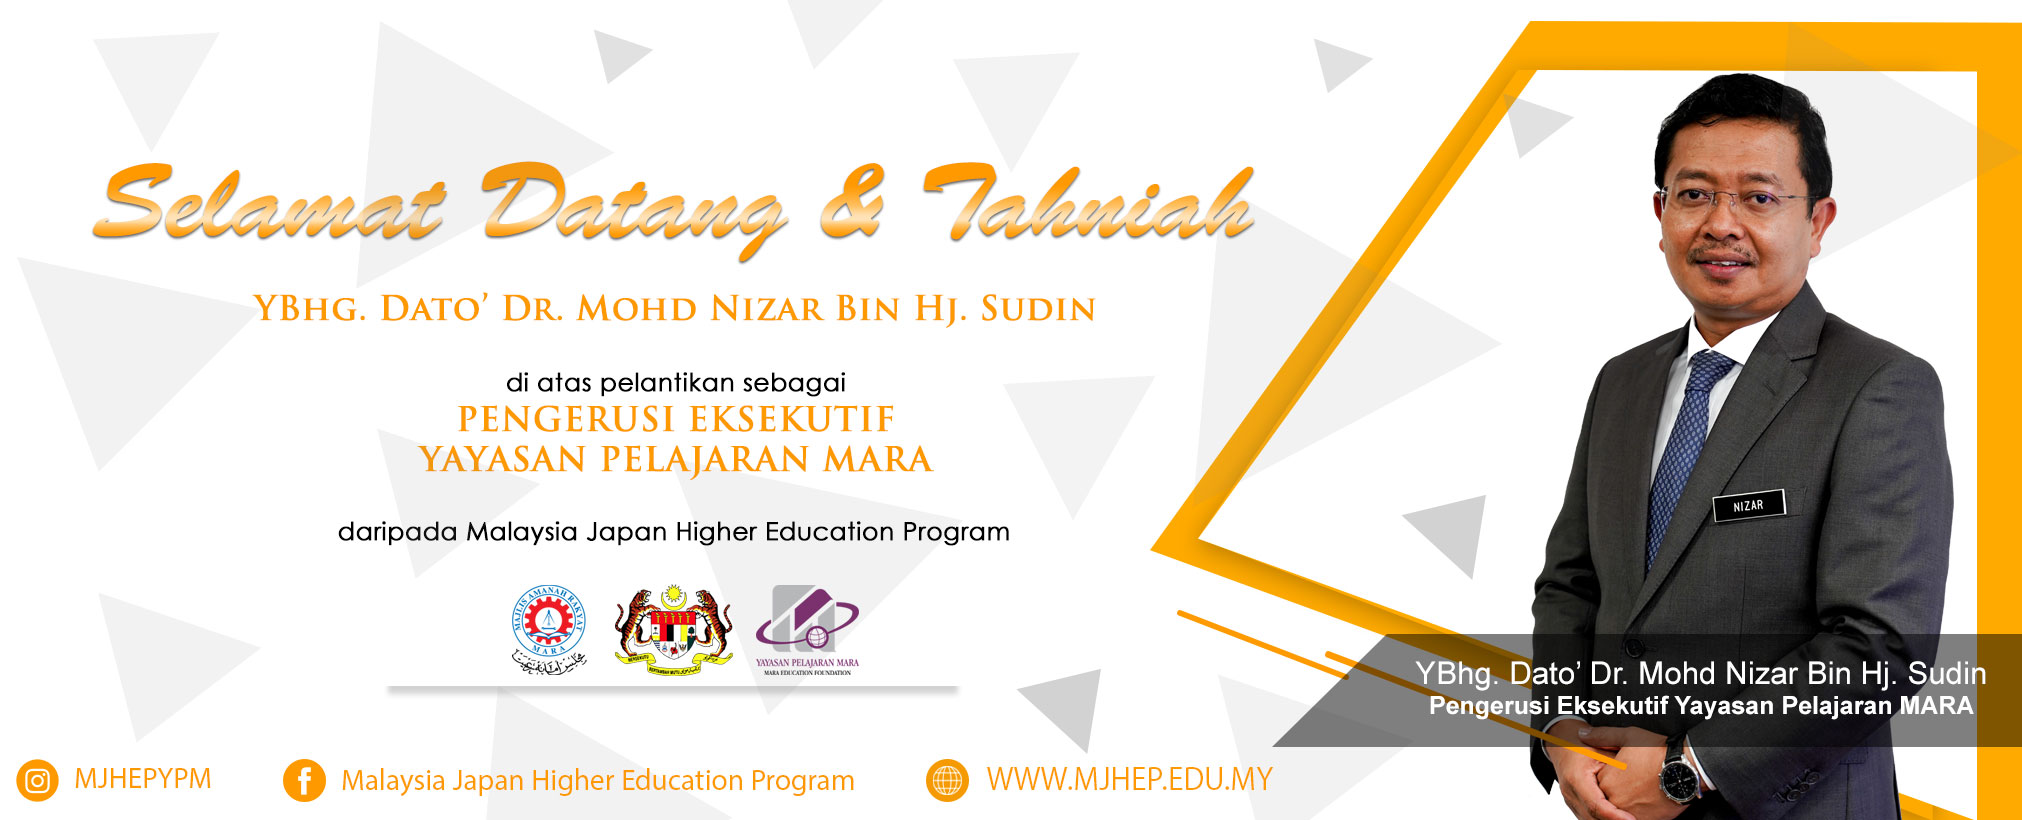 Tahniah Dato-Dr.-Mohd-Nizar-Bin-Hj